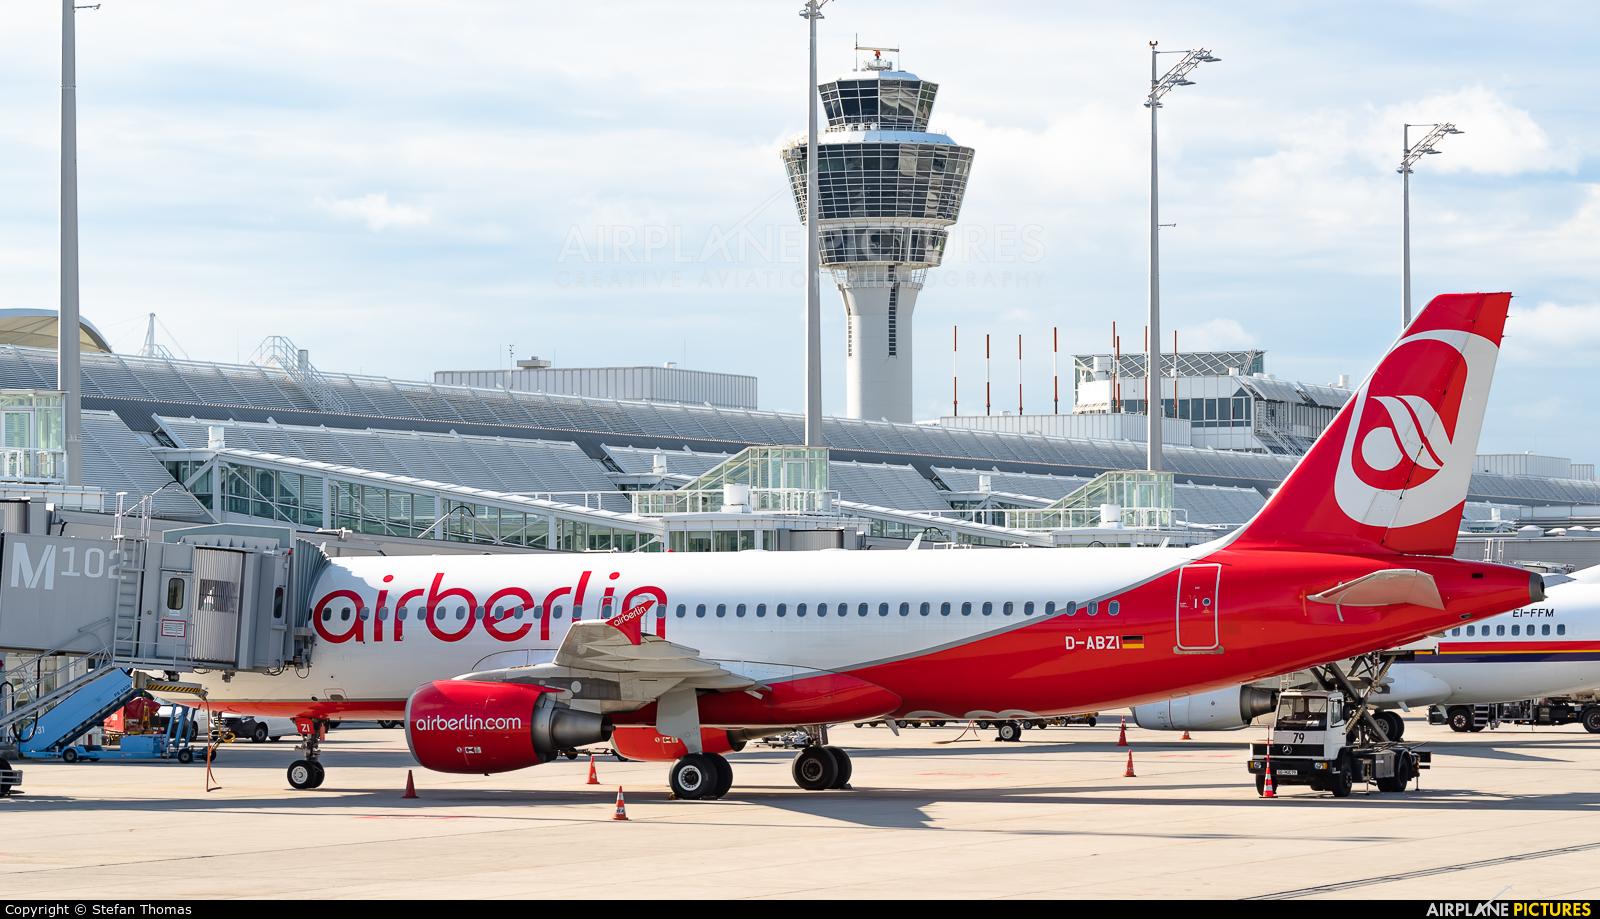 Air Berlin D-ABZI aircraft at Munich